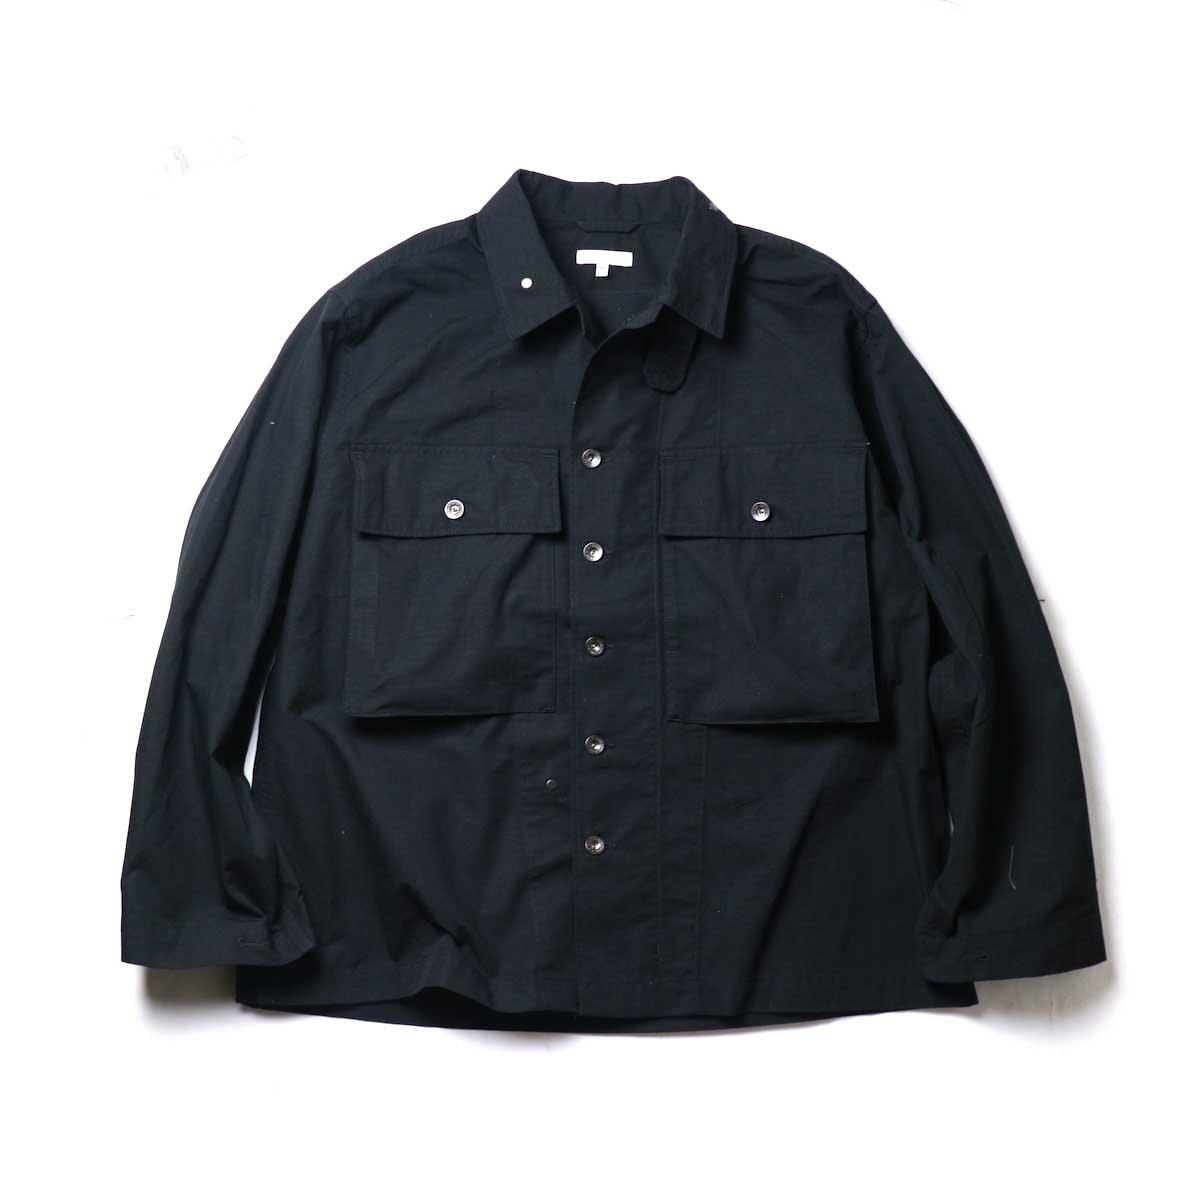 Engineered Garments / M43/2 Shirt Jacket -Cotton Ripstop (Black)